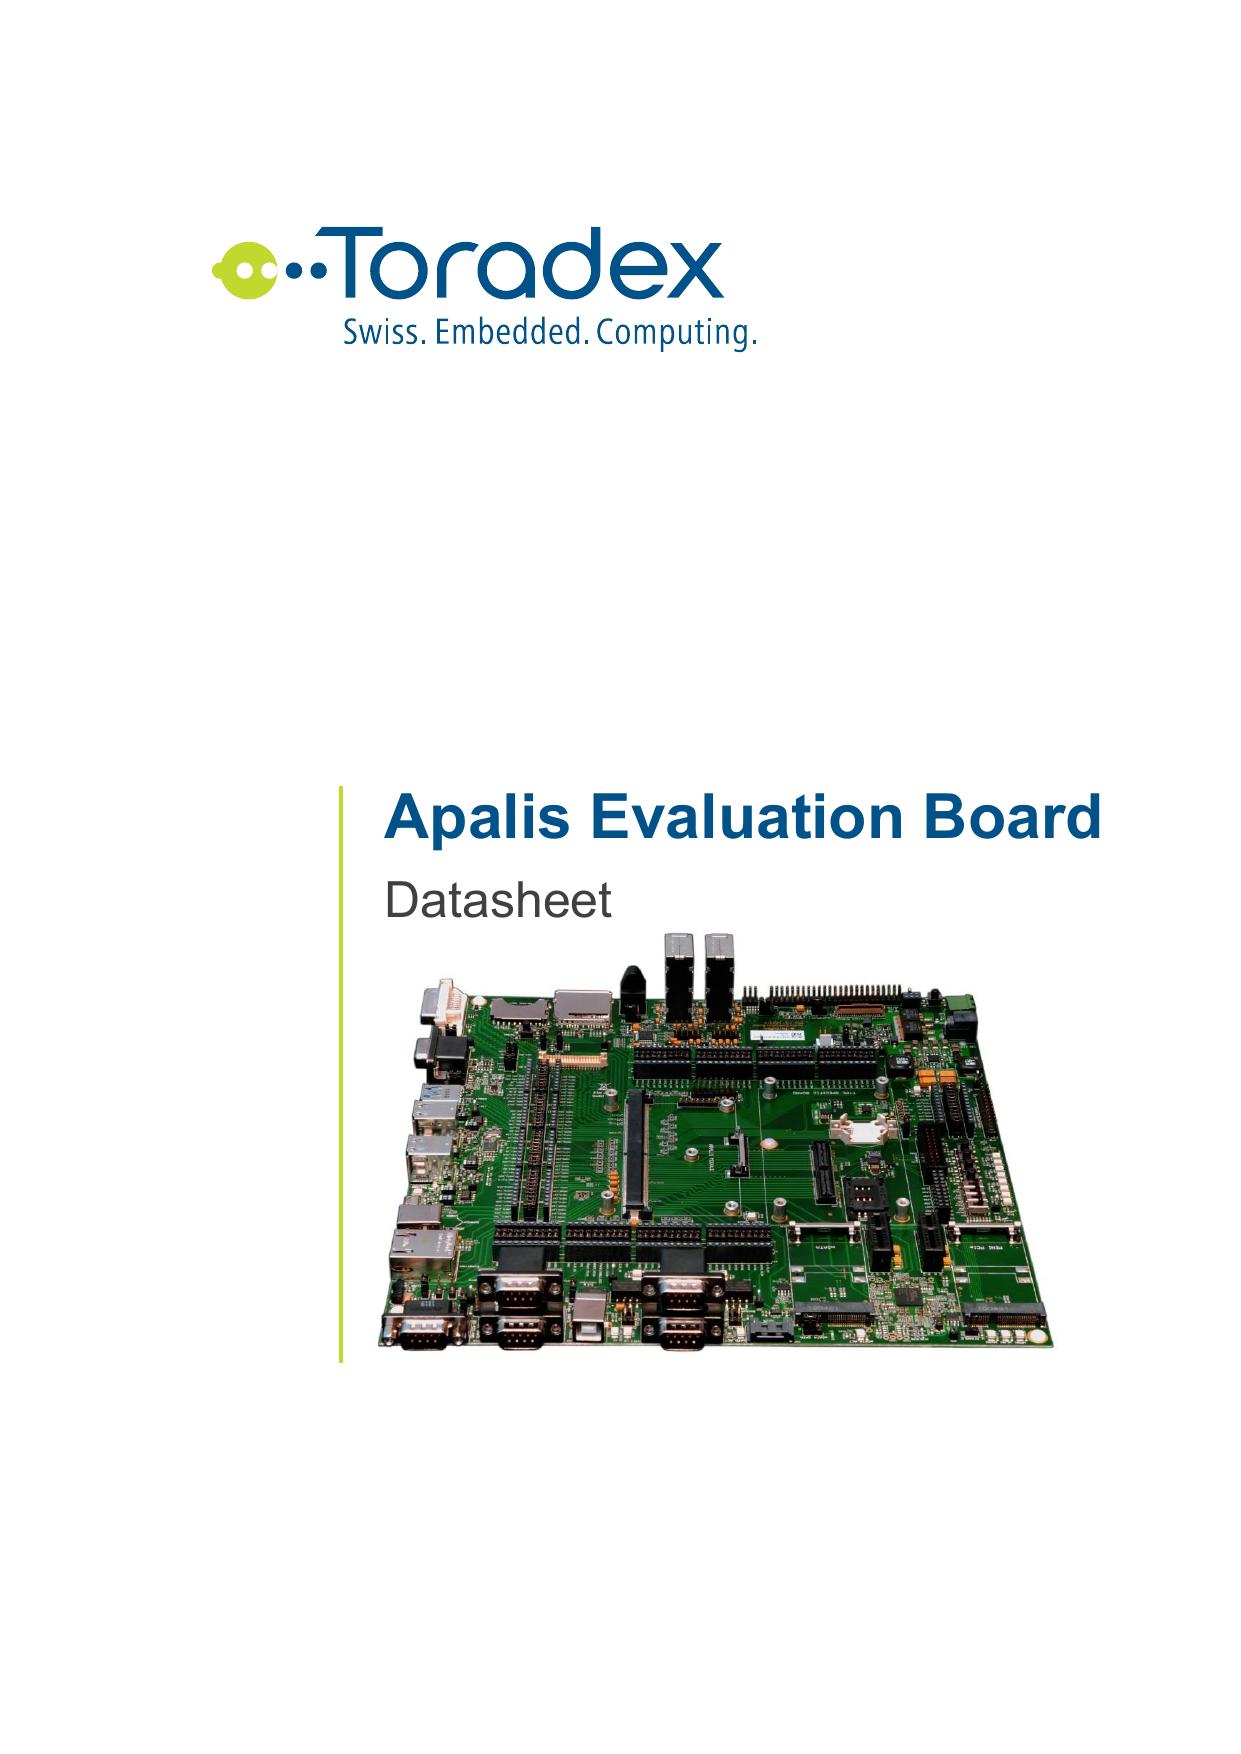 Apalis Evaluation Board Datasheet